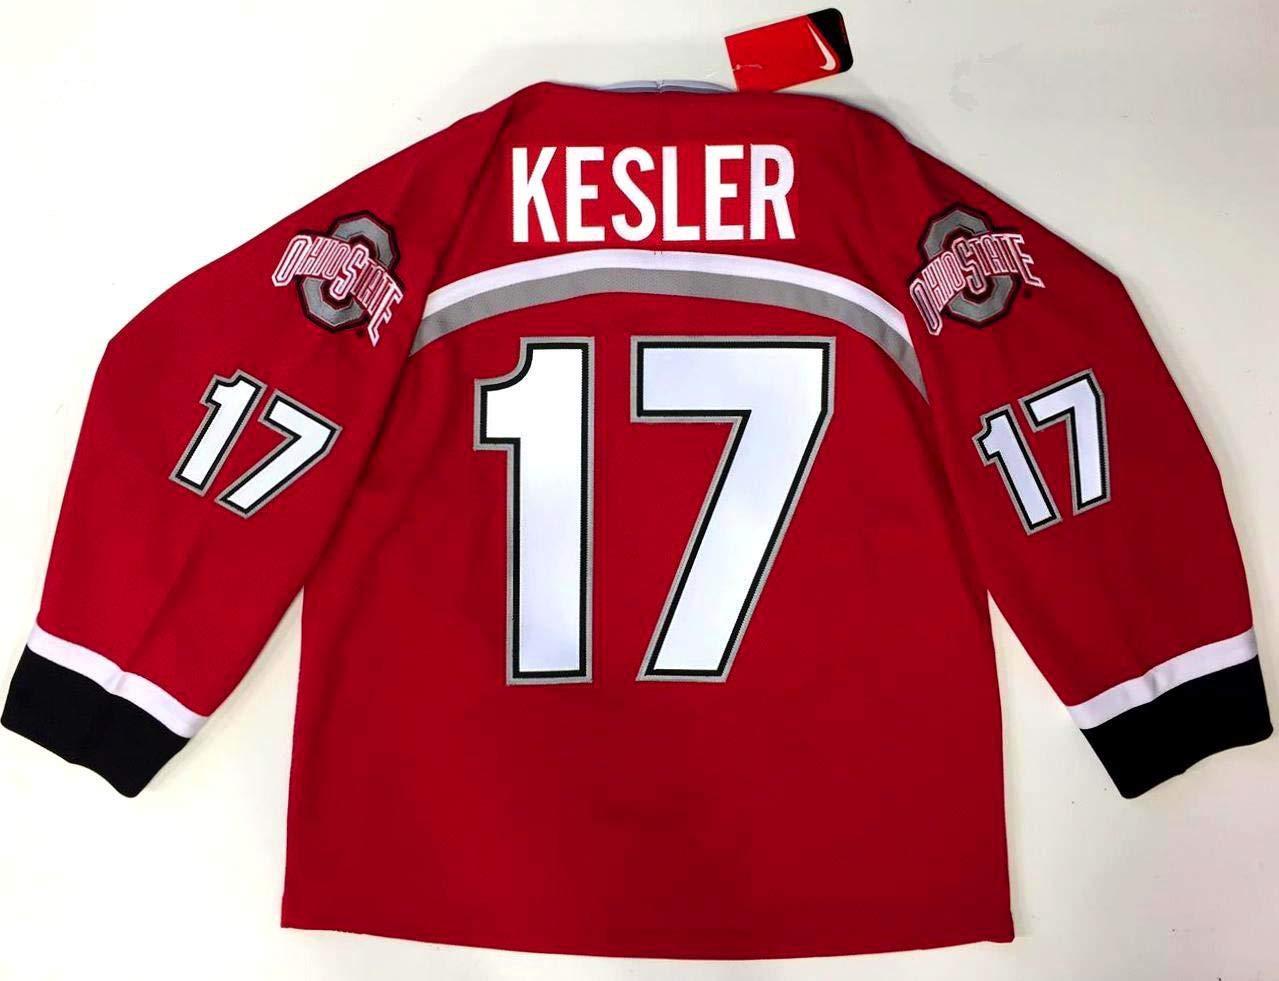 buy popular 6aa83 a0501 Ryan Kesler Jersey - Nike Ohio State Buckeyes Large New at ...